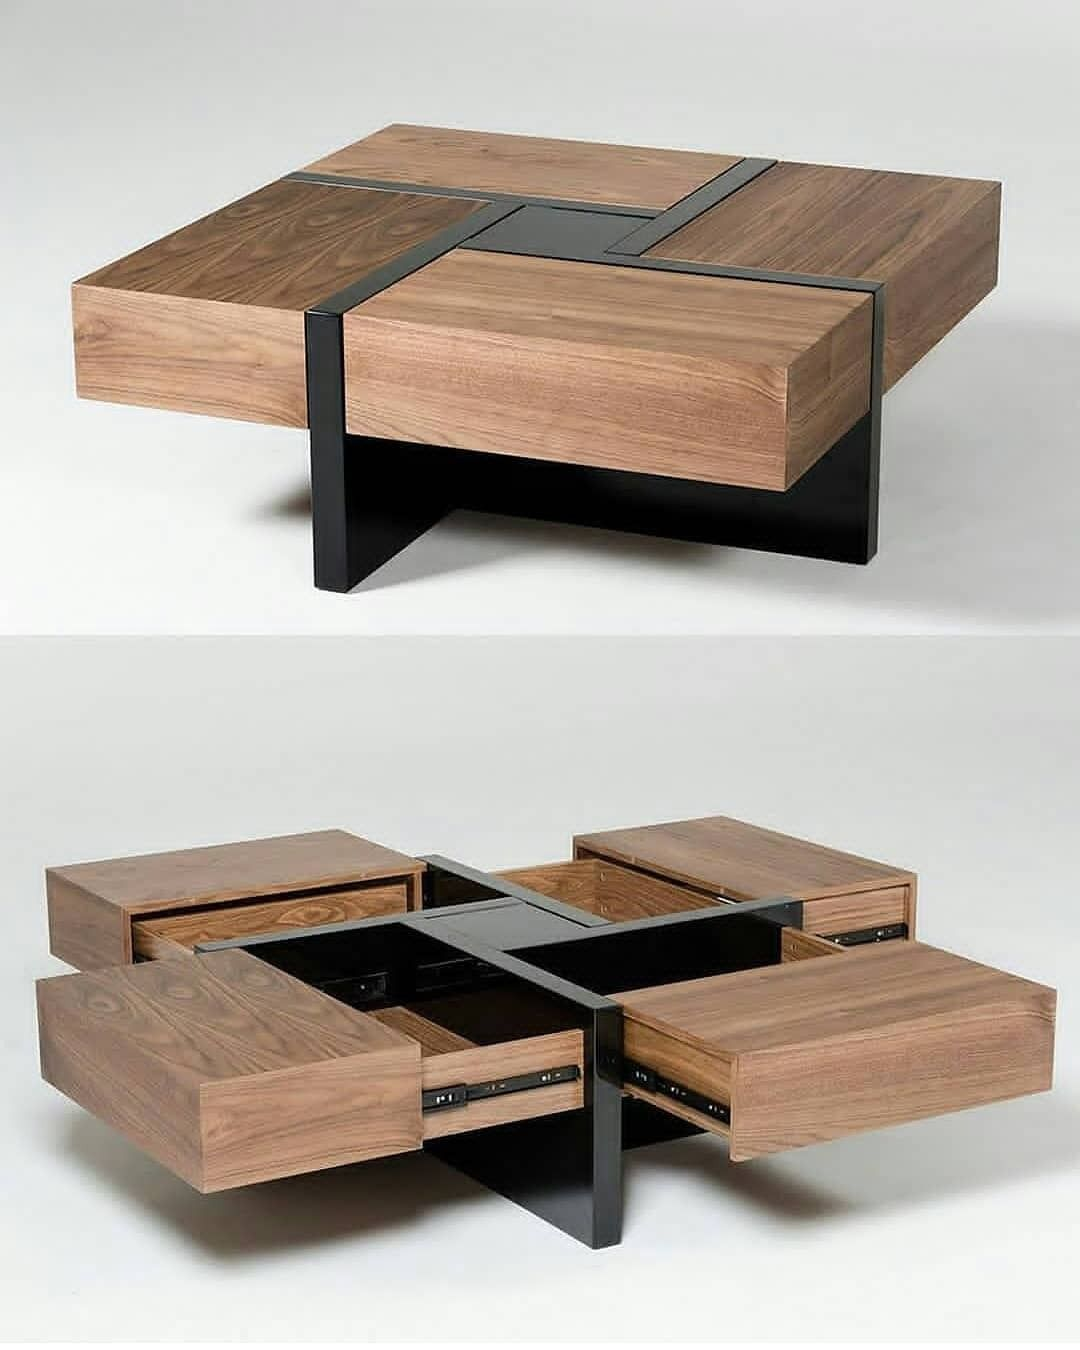 - Pin By Elitsa Koleva On For The Home In 2020 Modern Square